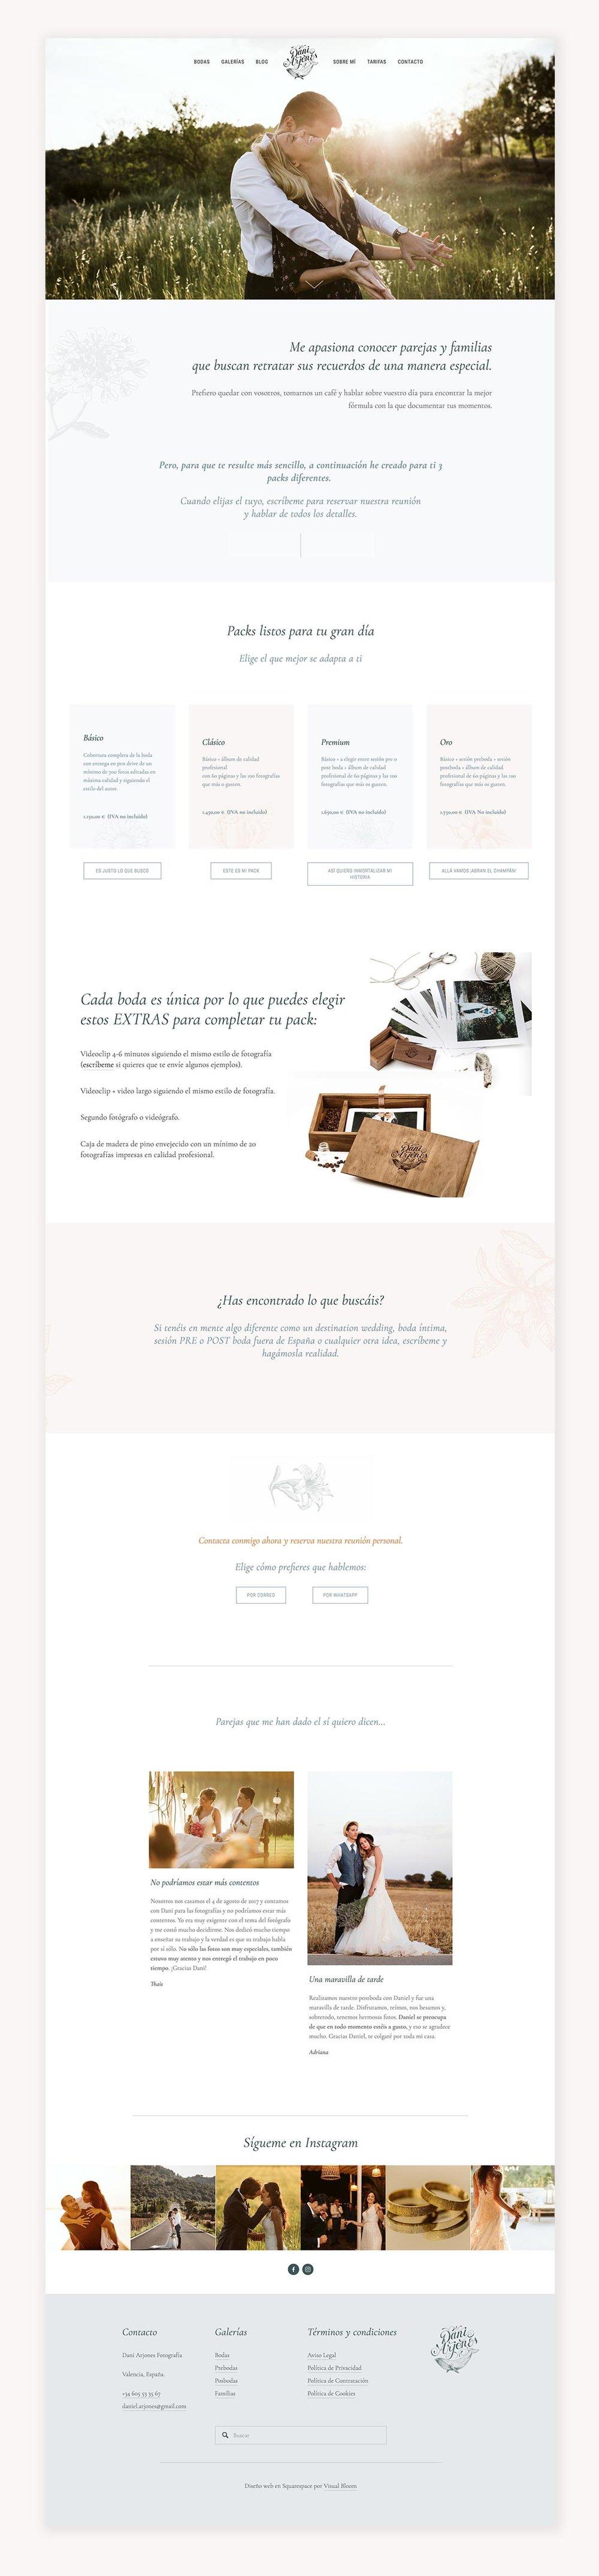 diseño web Squarespace tarifa.jpg